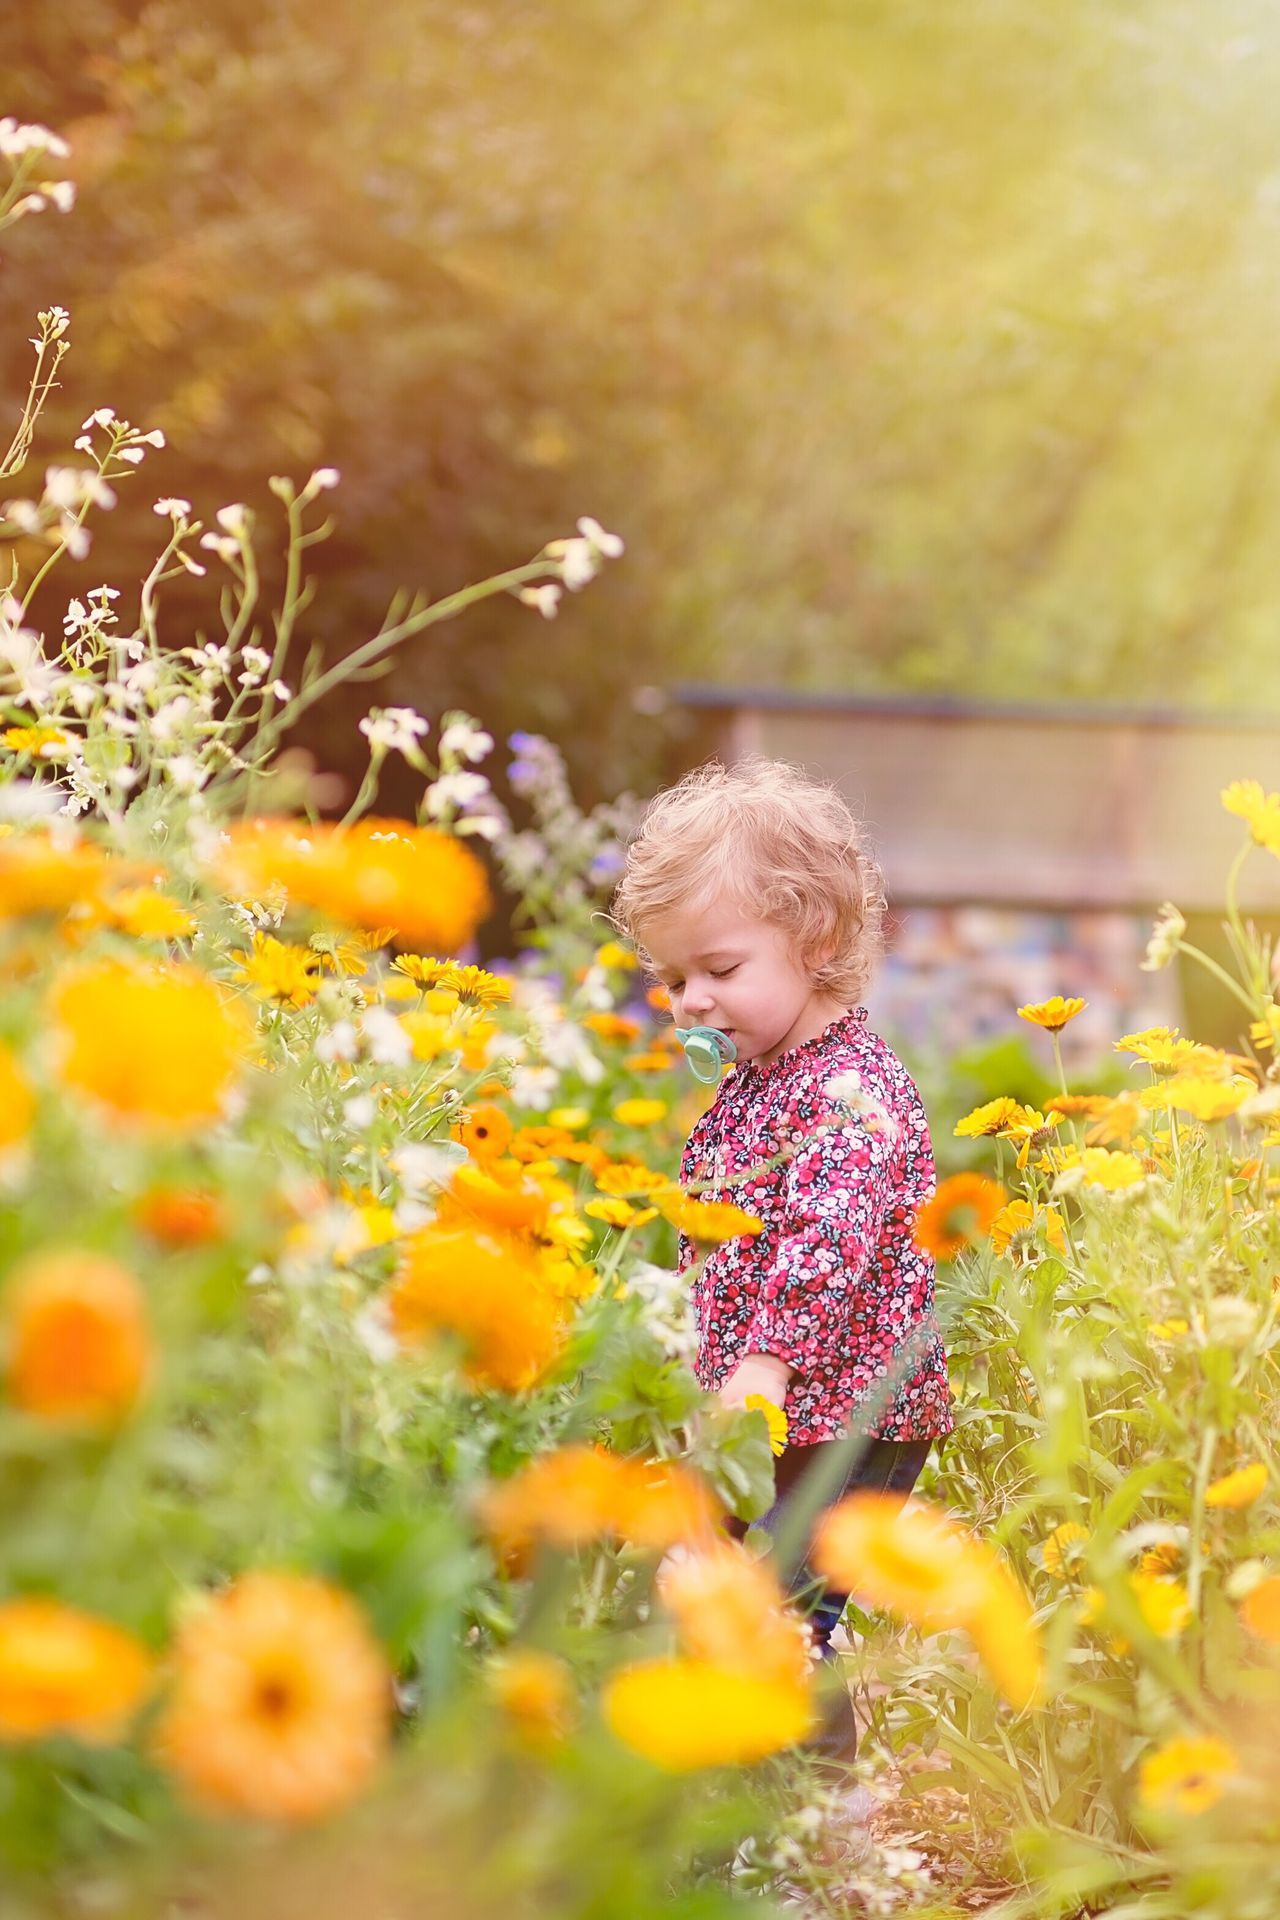 Beautiful stock photos of garden,  18-23 Months,  Baby Girls,  Blond Hair,  Botany